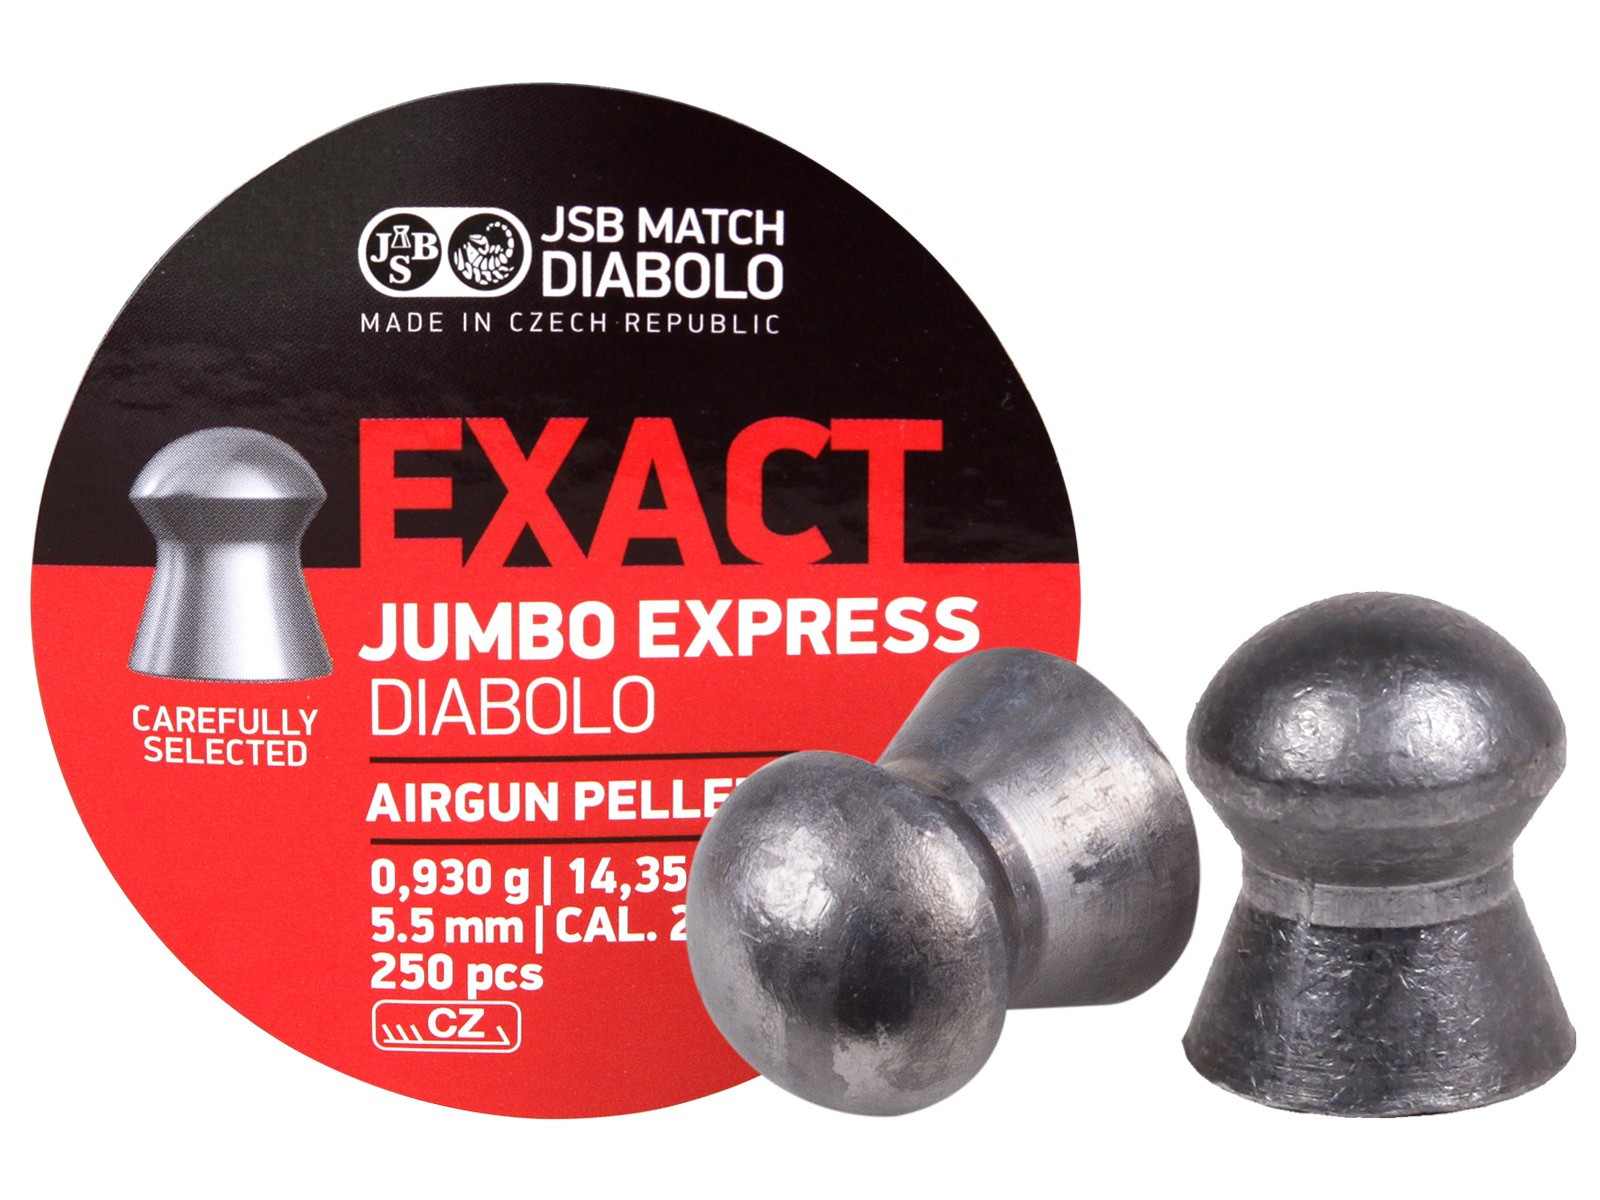 JSB Diabolo Exact Jumbo Express .22 Cal , 14.3 gr - 250 ct